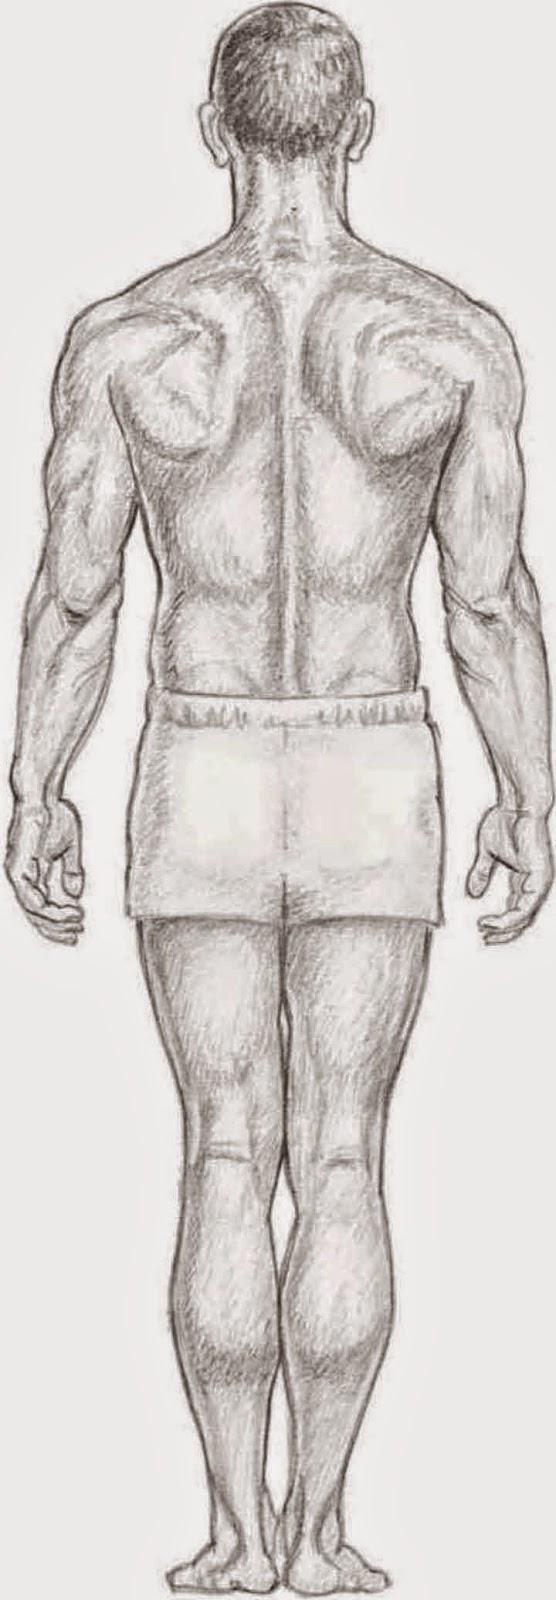 Drawings: UNDERSTANDING BODY ANATOMY